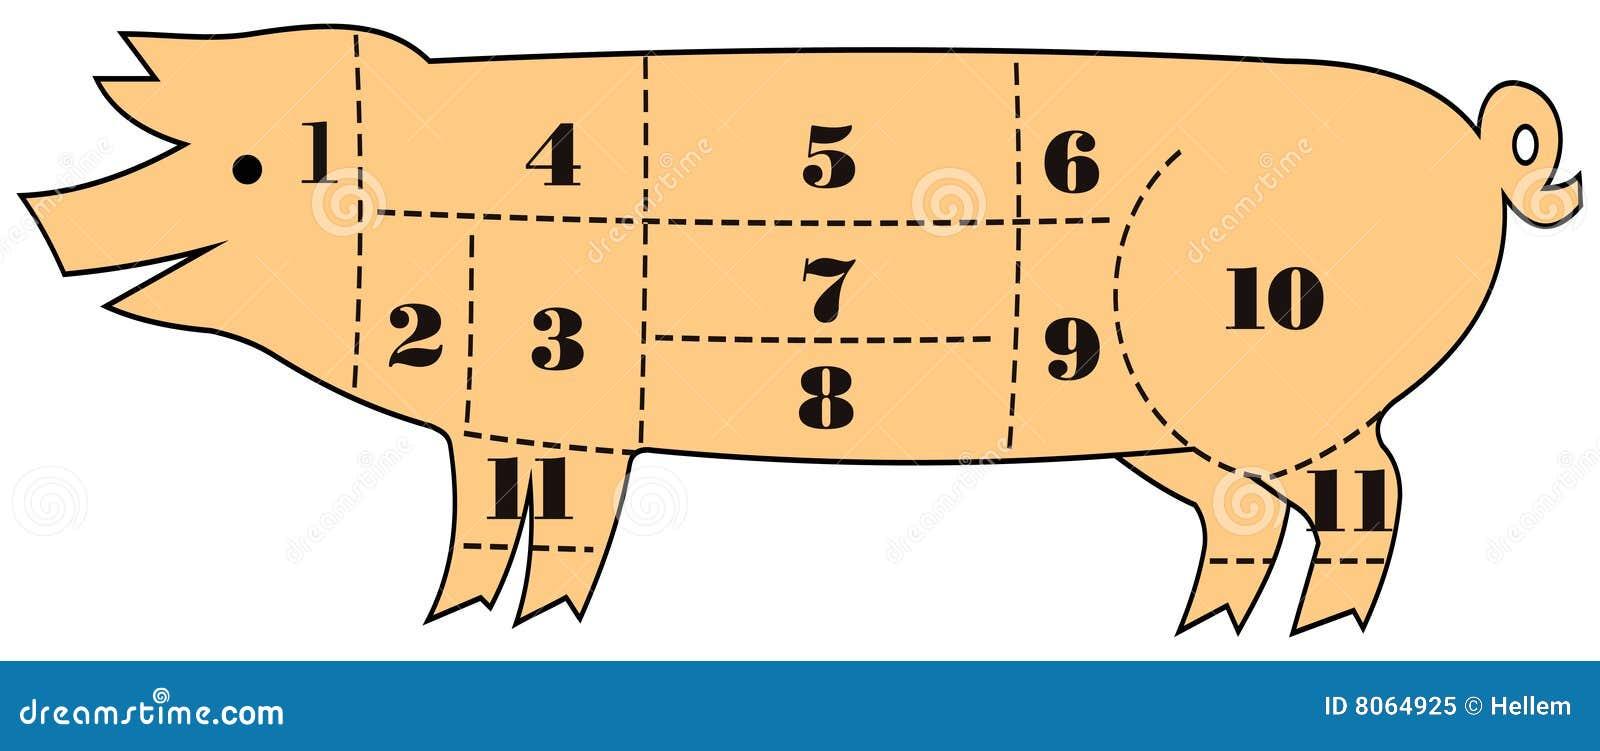 Pig Cut Out Stock Vector Illustration Of Mammal Steak 8064925 Diagram